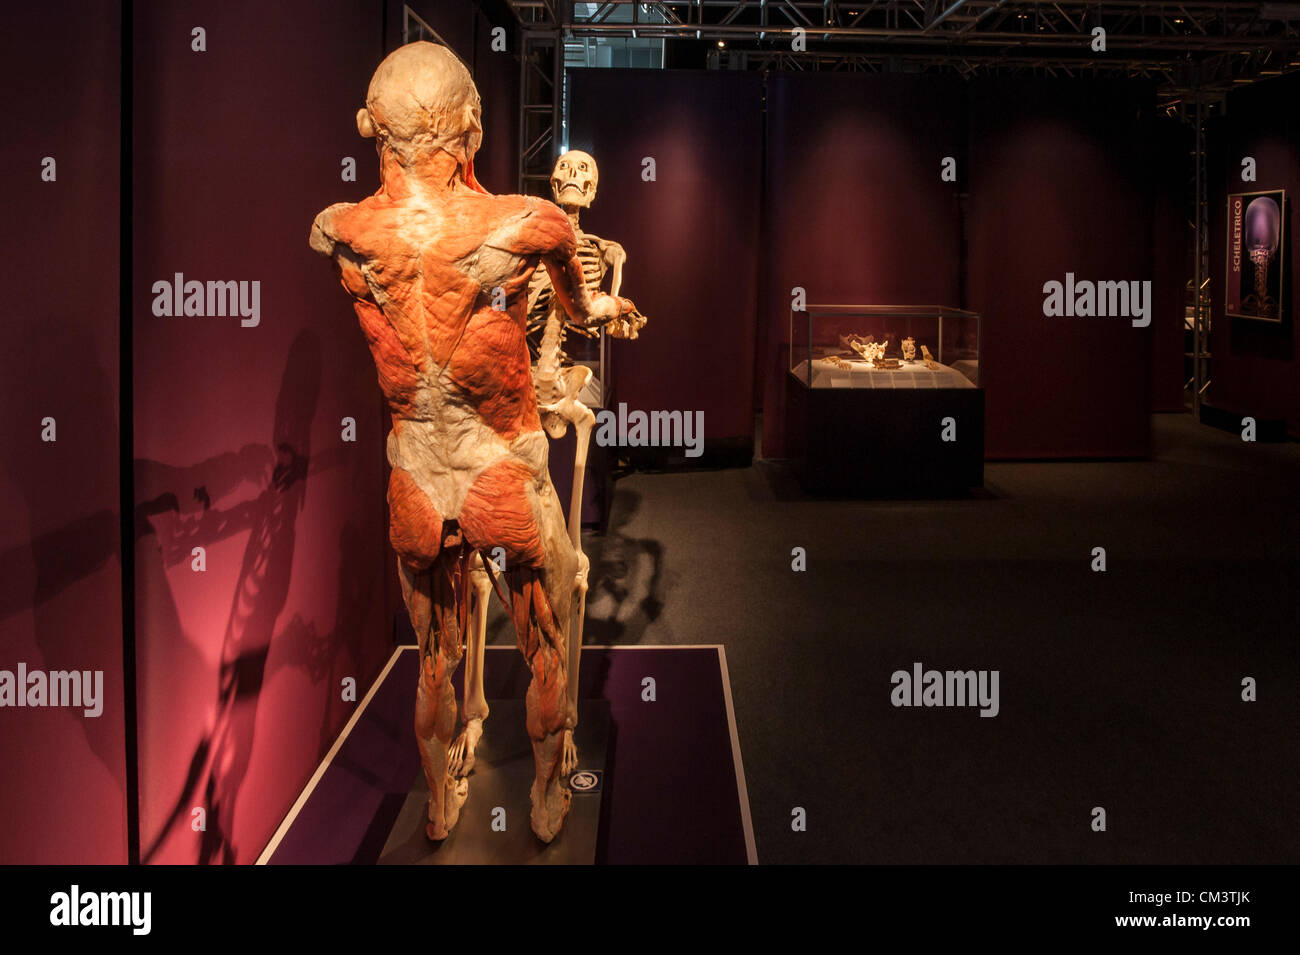 Body Organs Stockfotos & Body Organs Bilder - Alamy